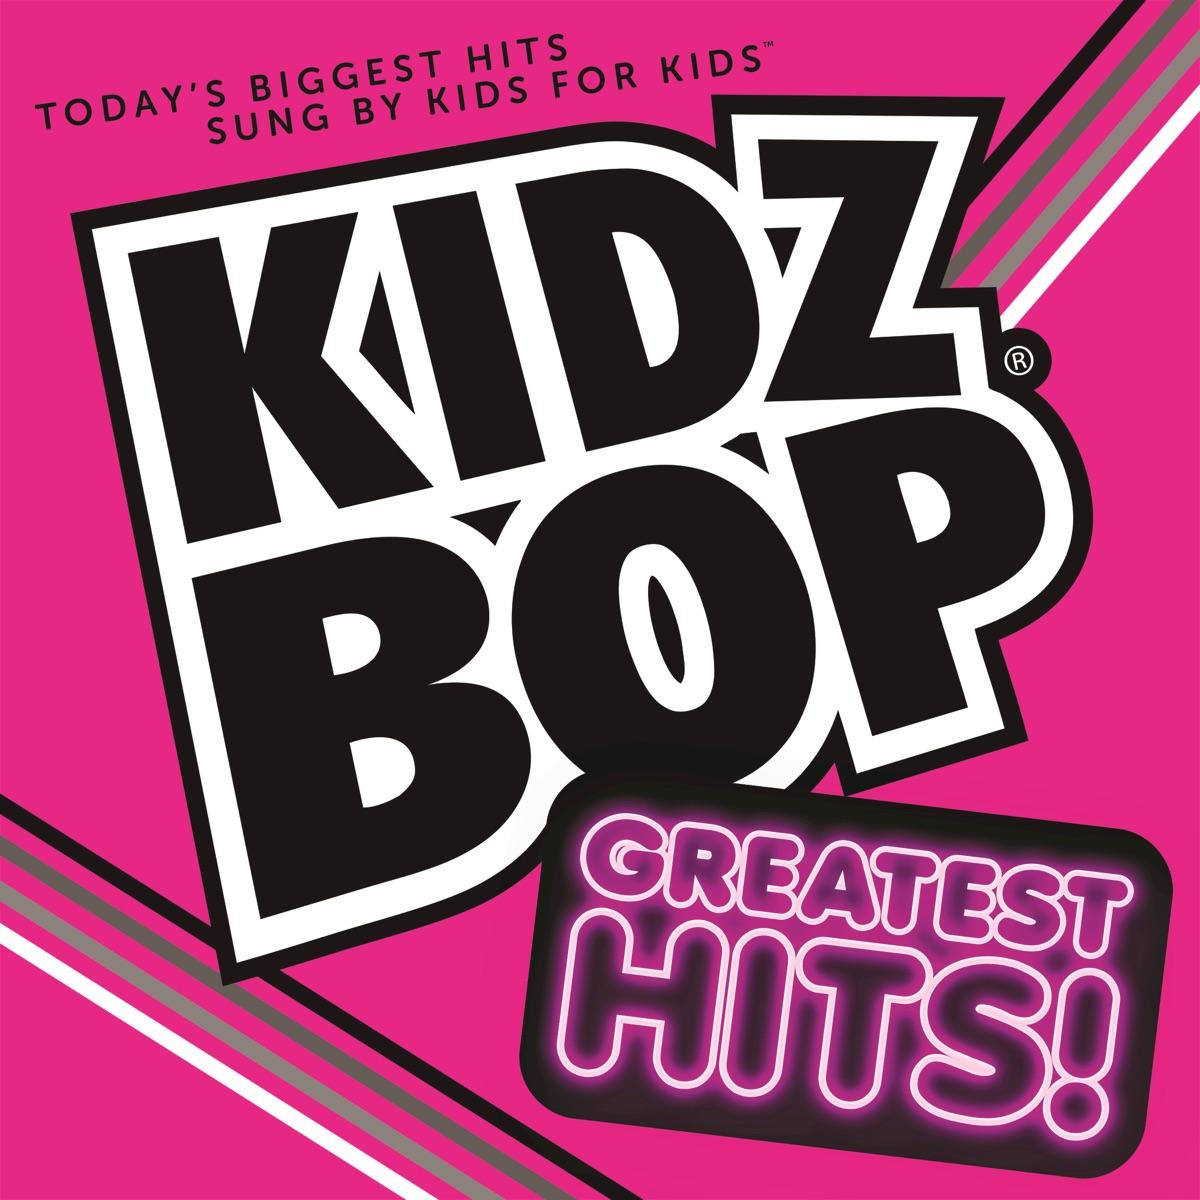 KIDZ BOP Greatest Hits! Album Cover by KIDZ BOP Kids